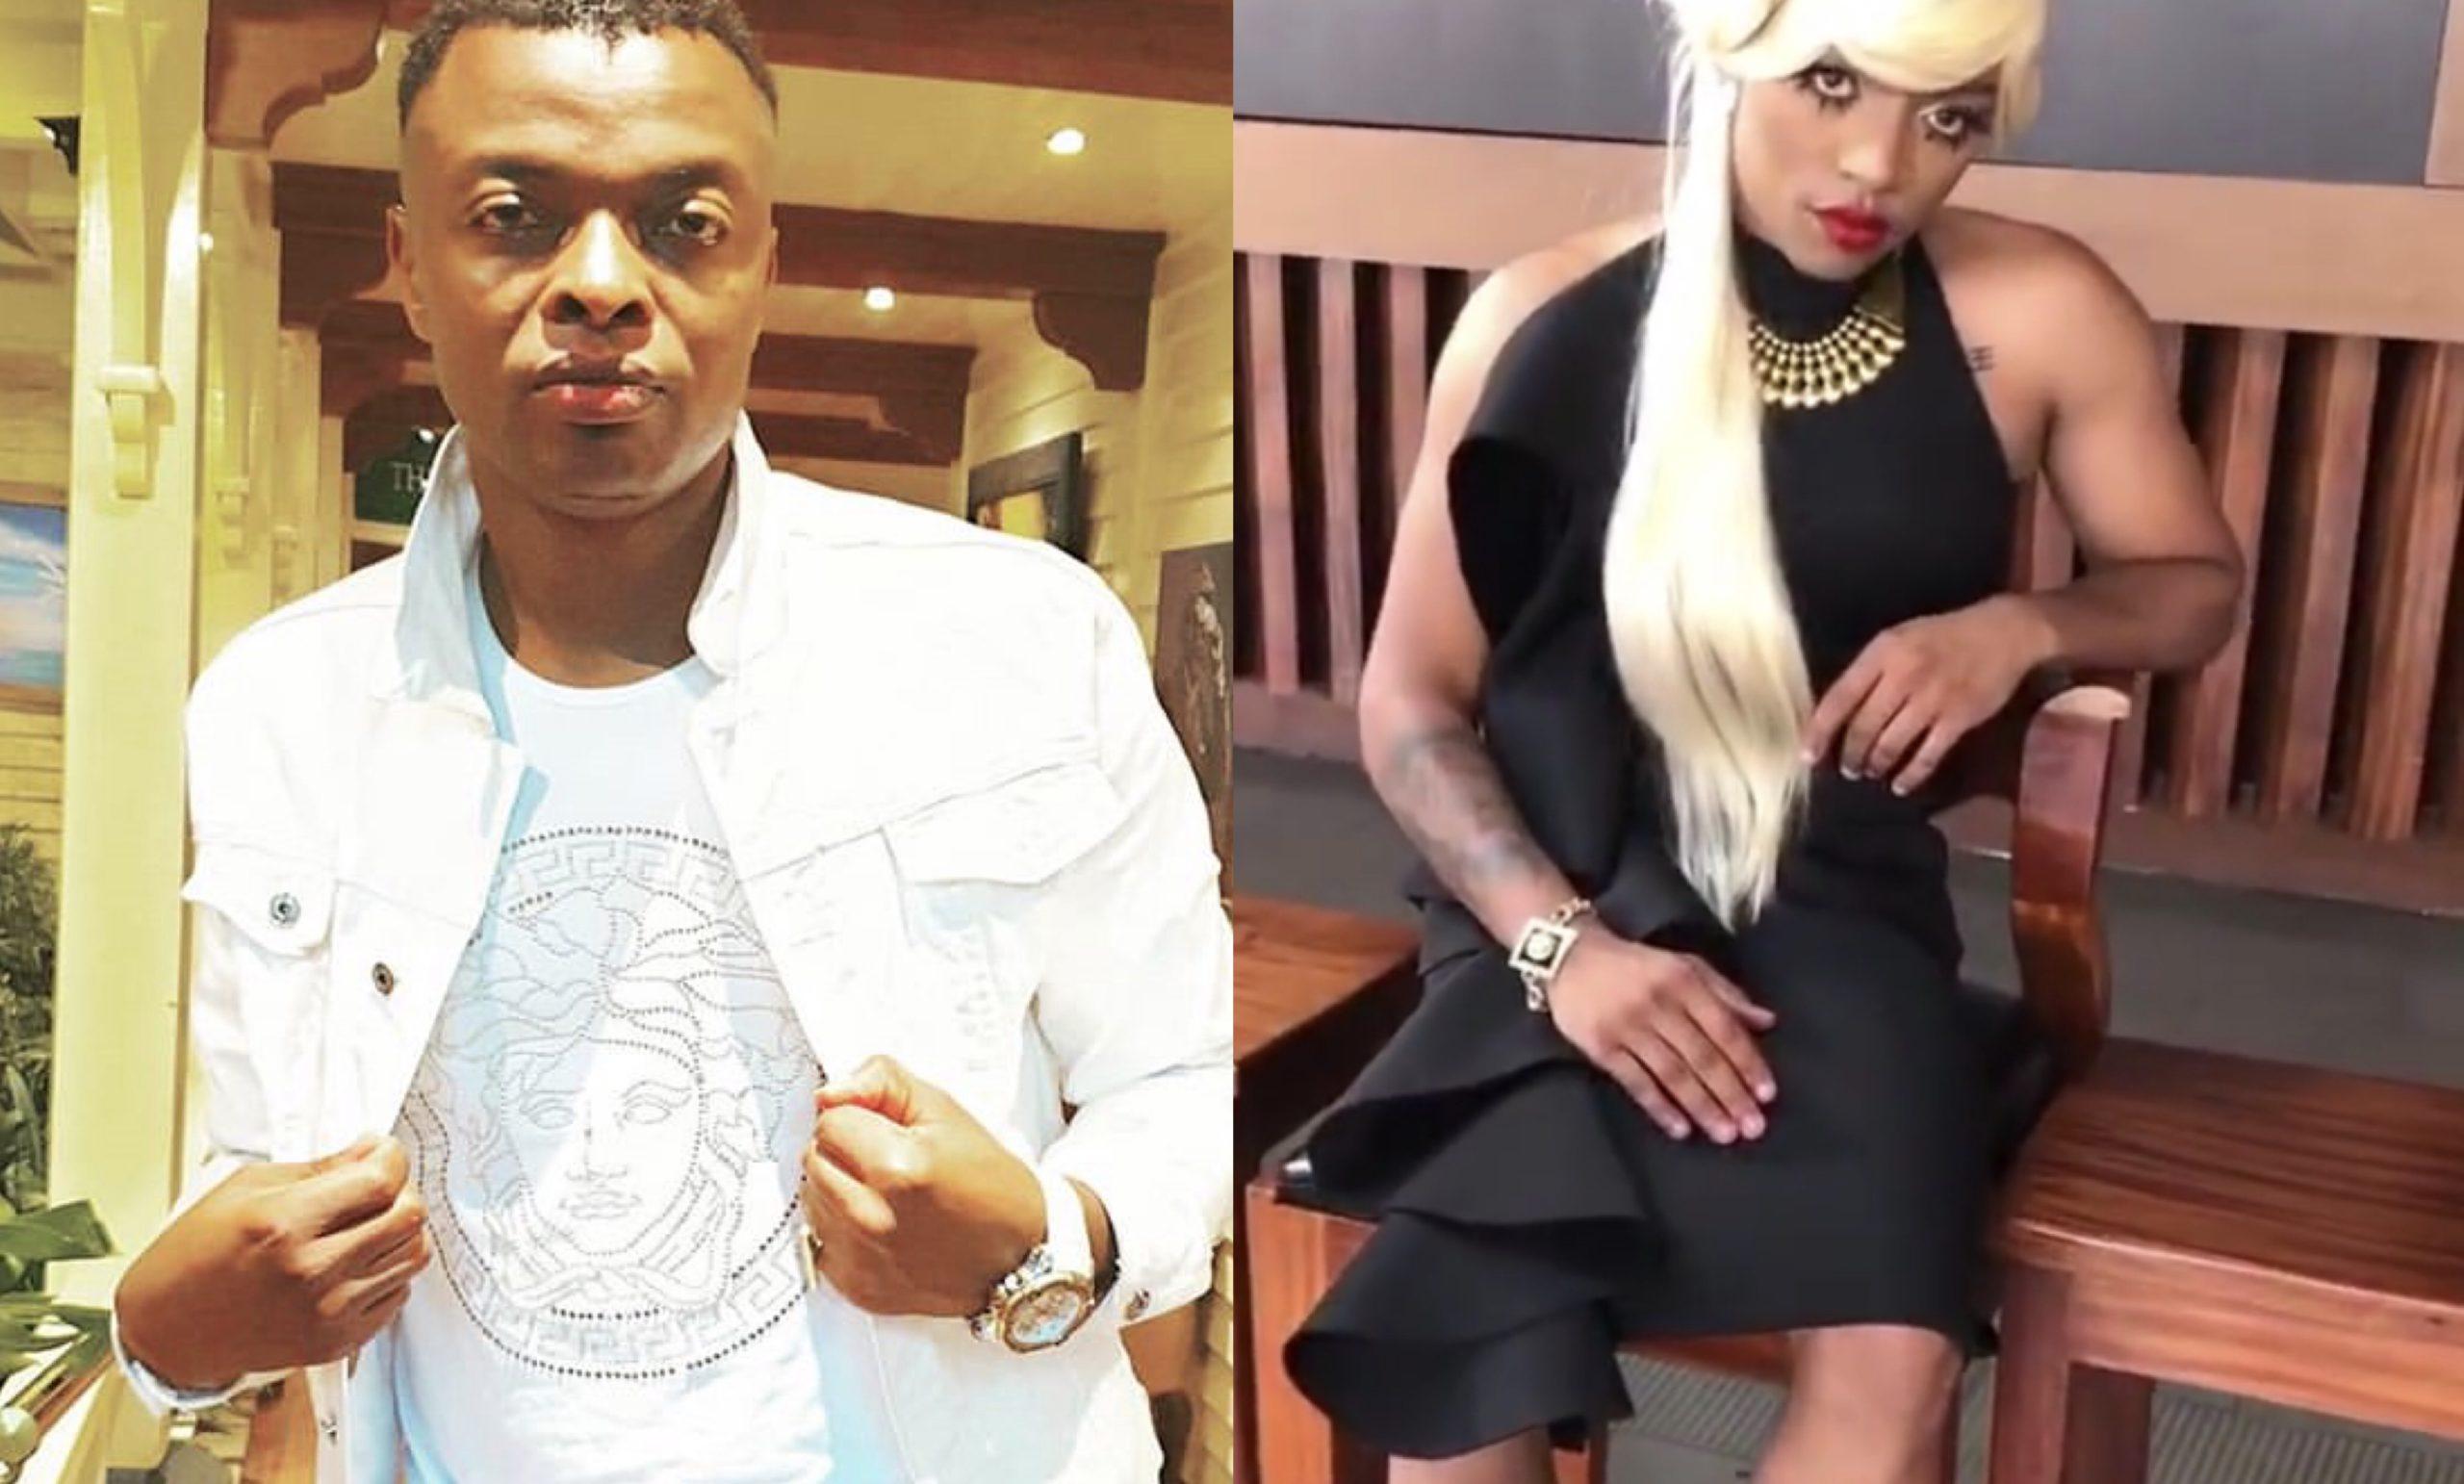 Ringtone accuses Bahati and Masterpiece of secretly dating fellow men! (Photo)